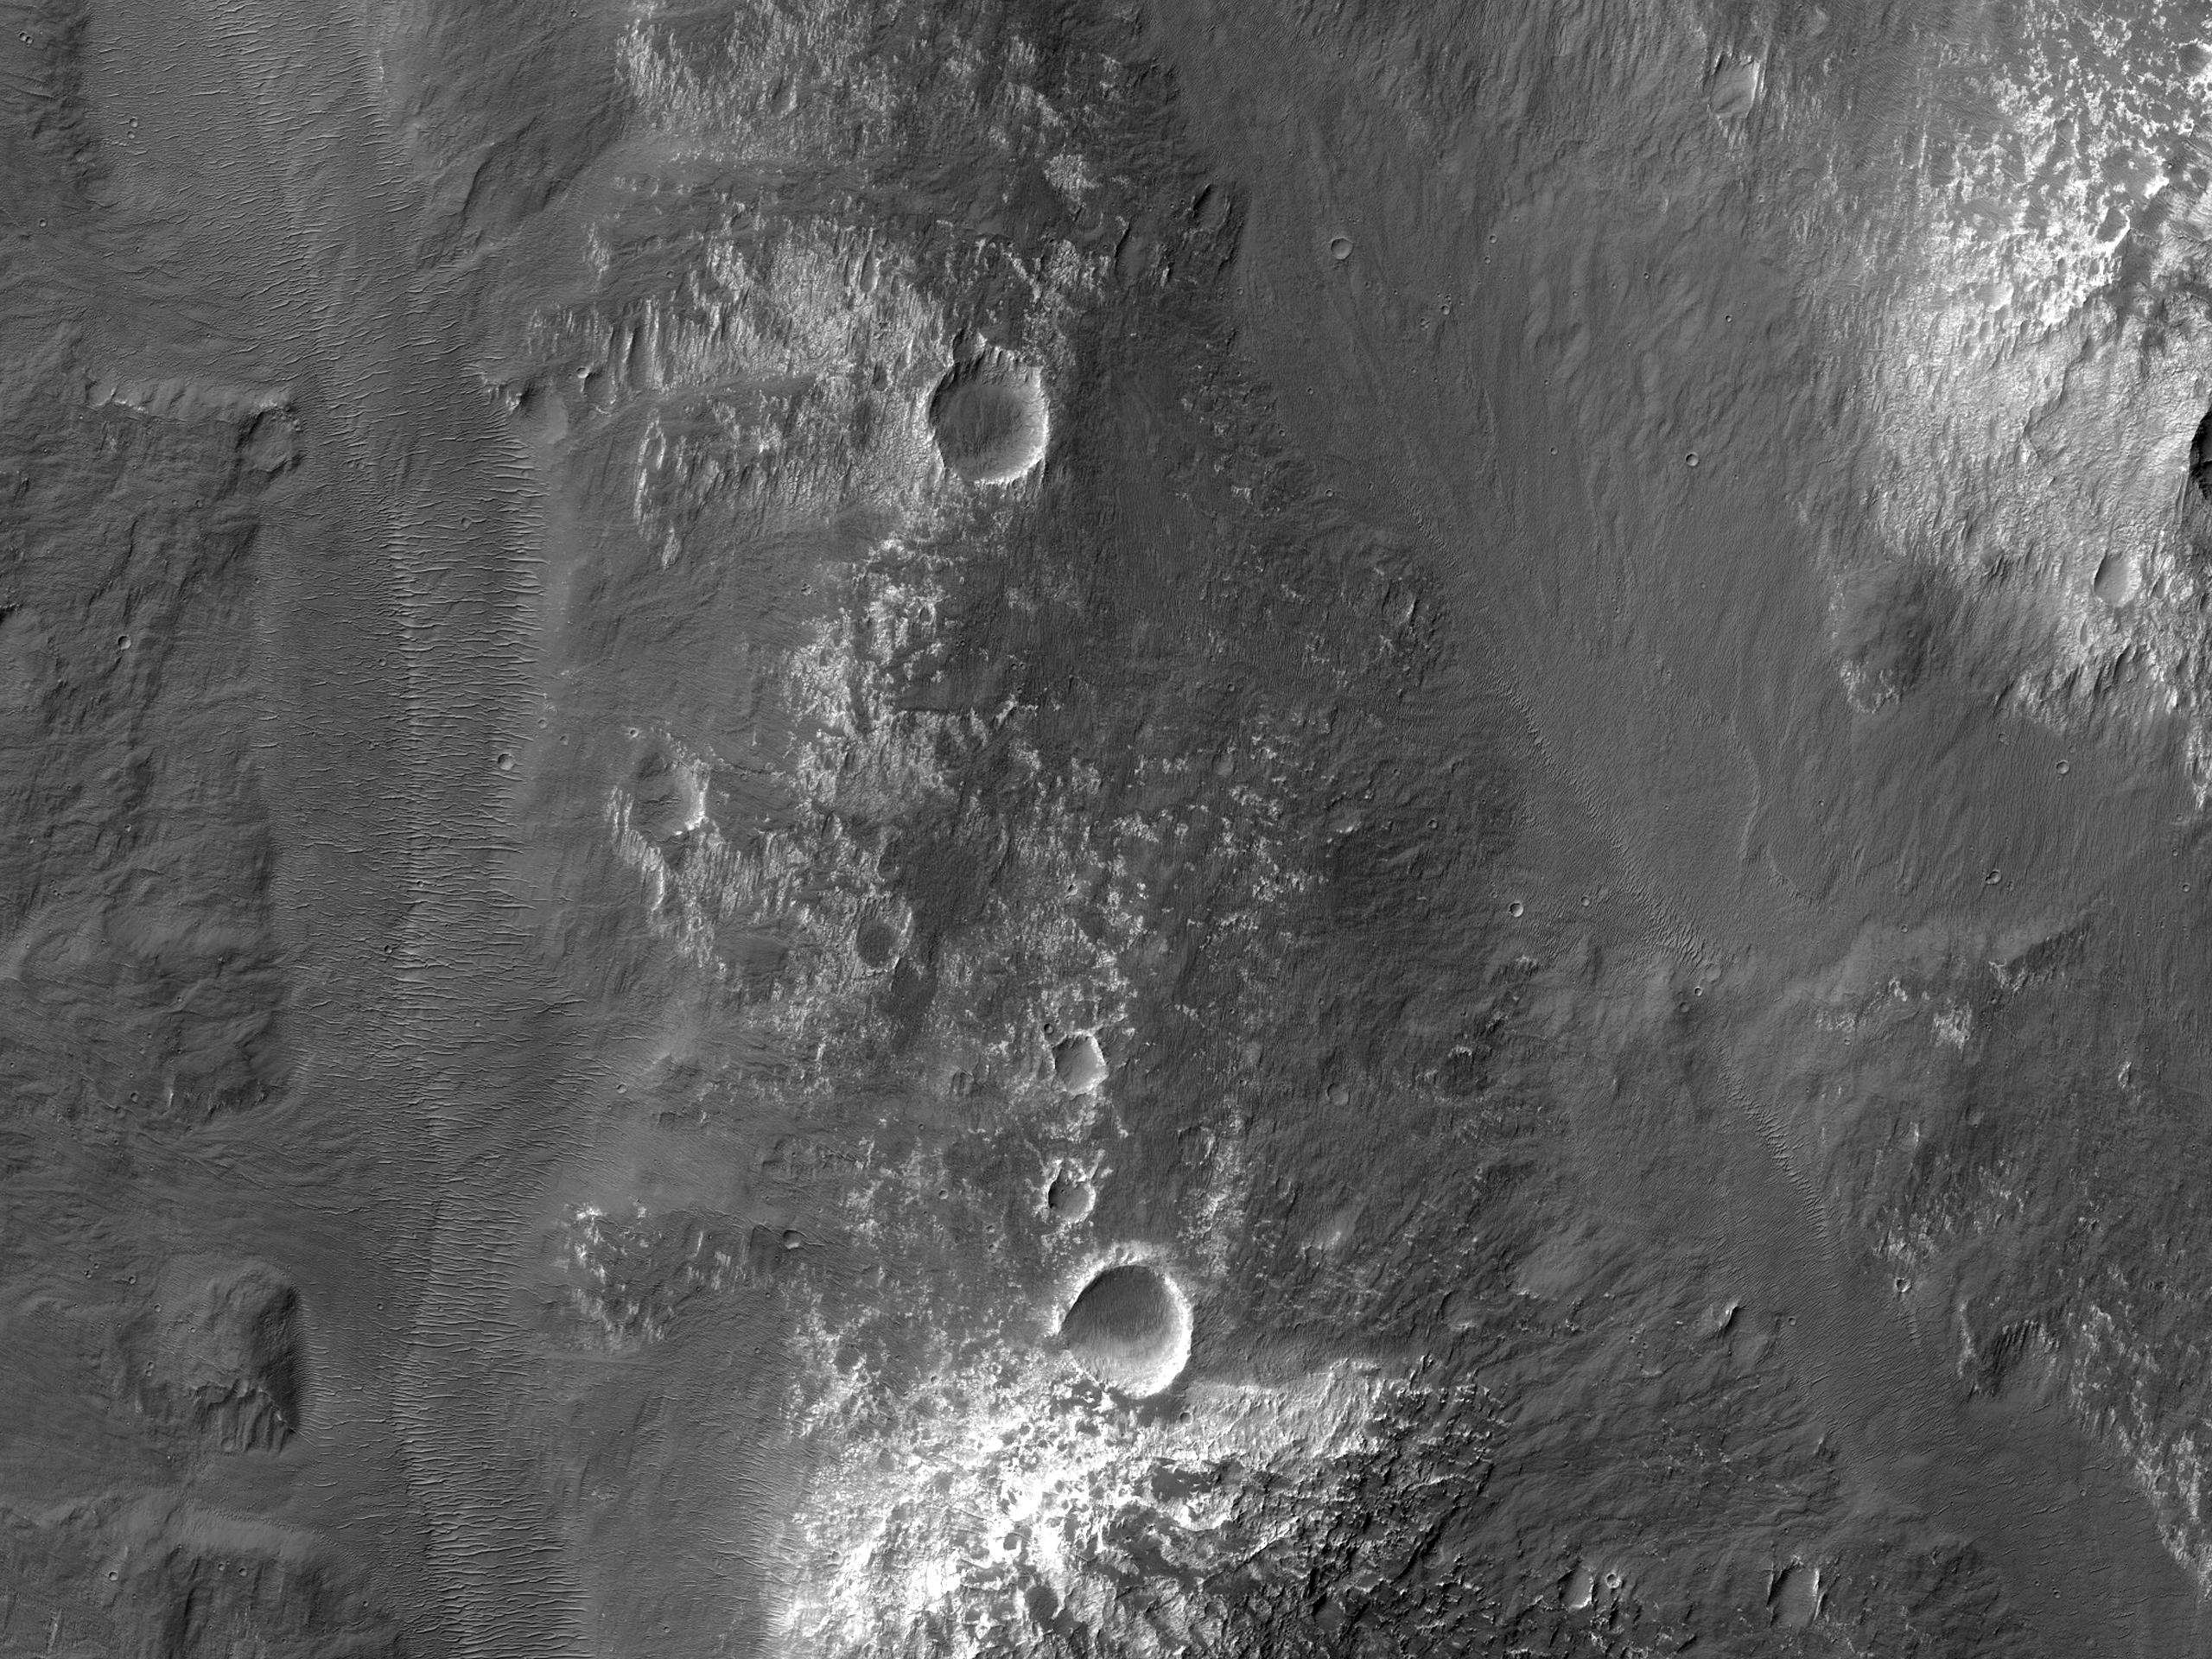 A Side Channel of Uzboi Vallis